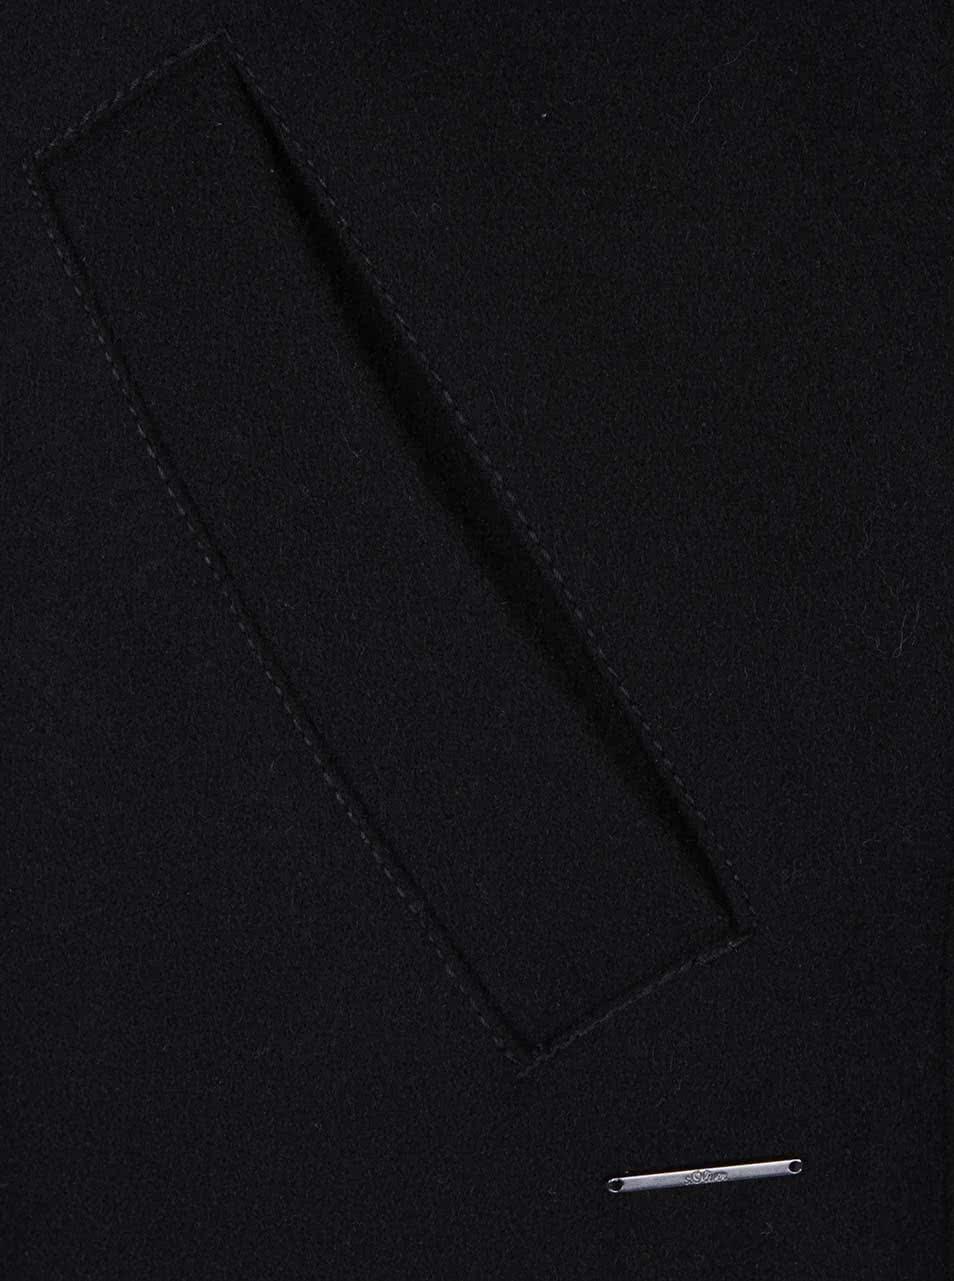 c1f0257c4 Čierny dámsky vlnený kabát s bundou 2v1 s.Oliver   ZOOT.sk